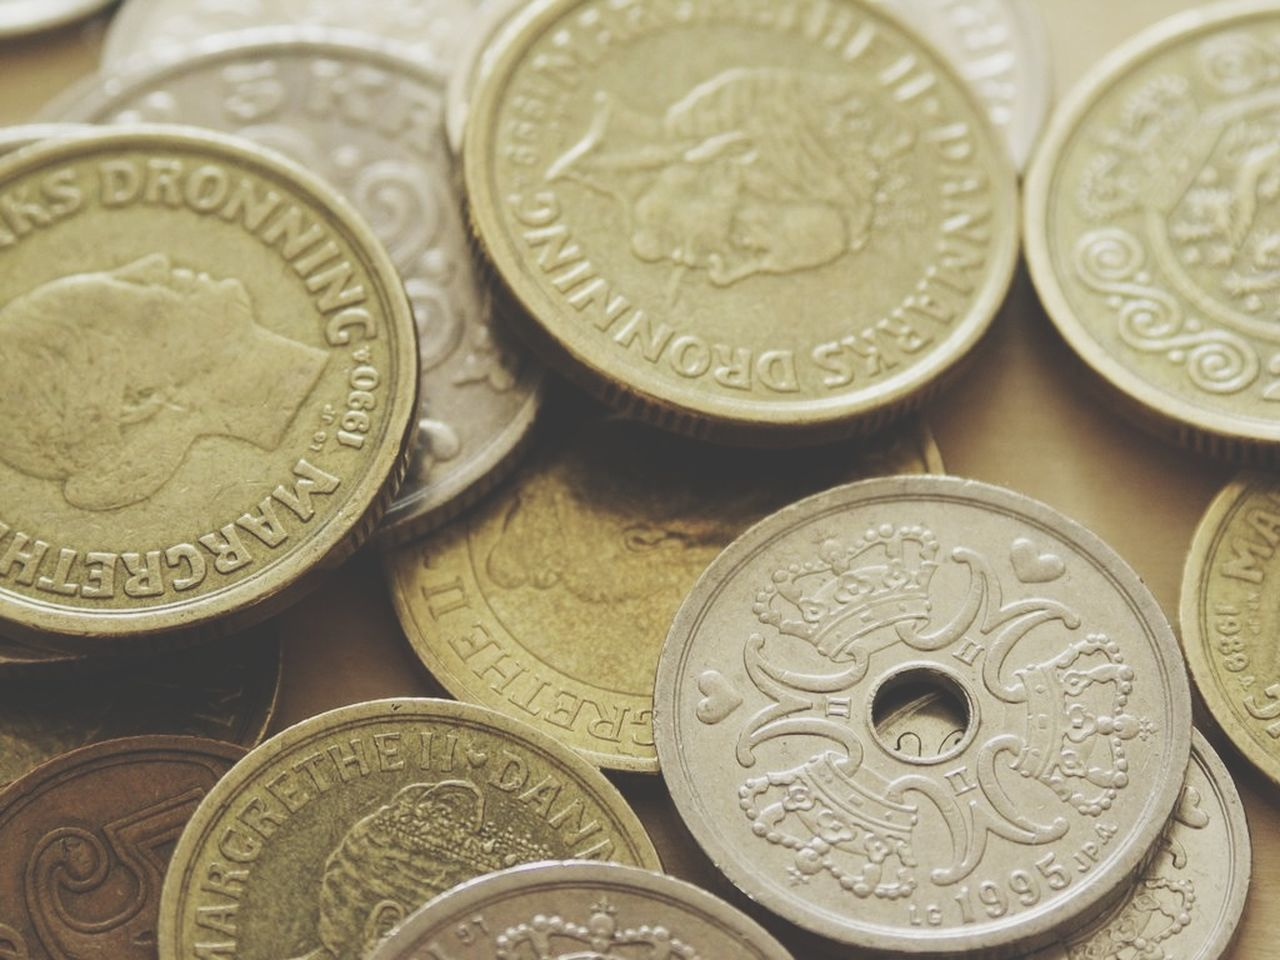 FULL FRAME SHOT OF COINS ON METAL